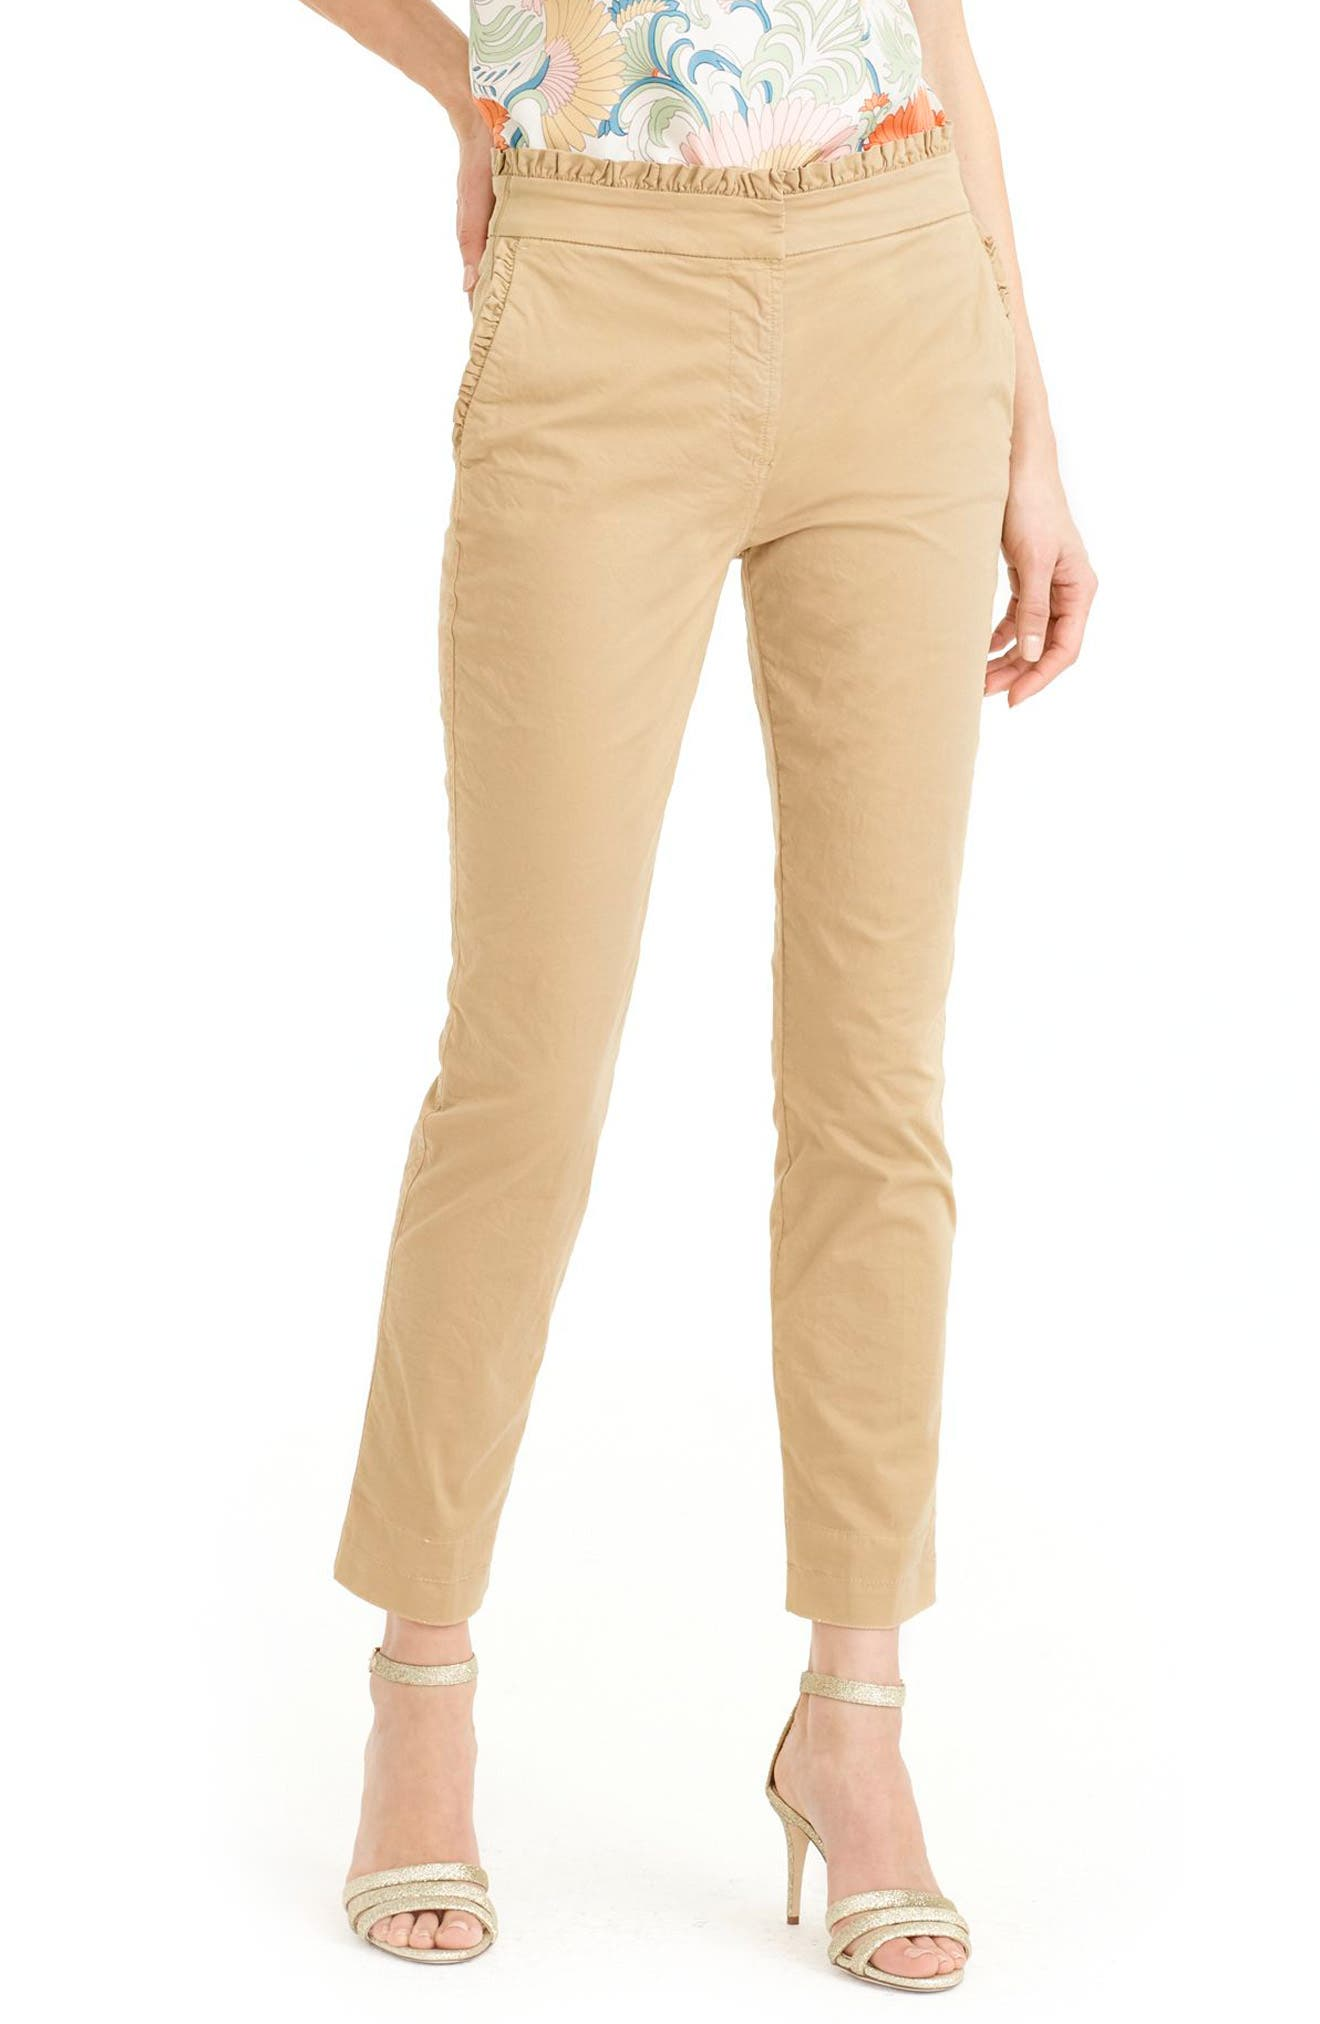 Main Image - J.Crew Ruffle Crop Chino Pants (Regular & Petite)